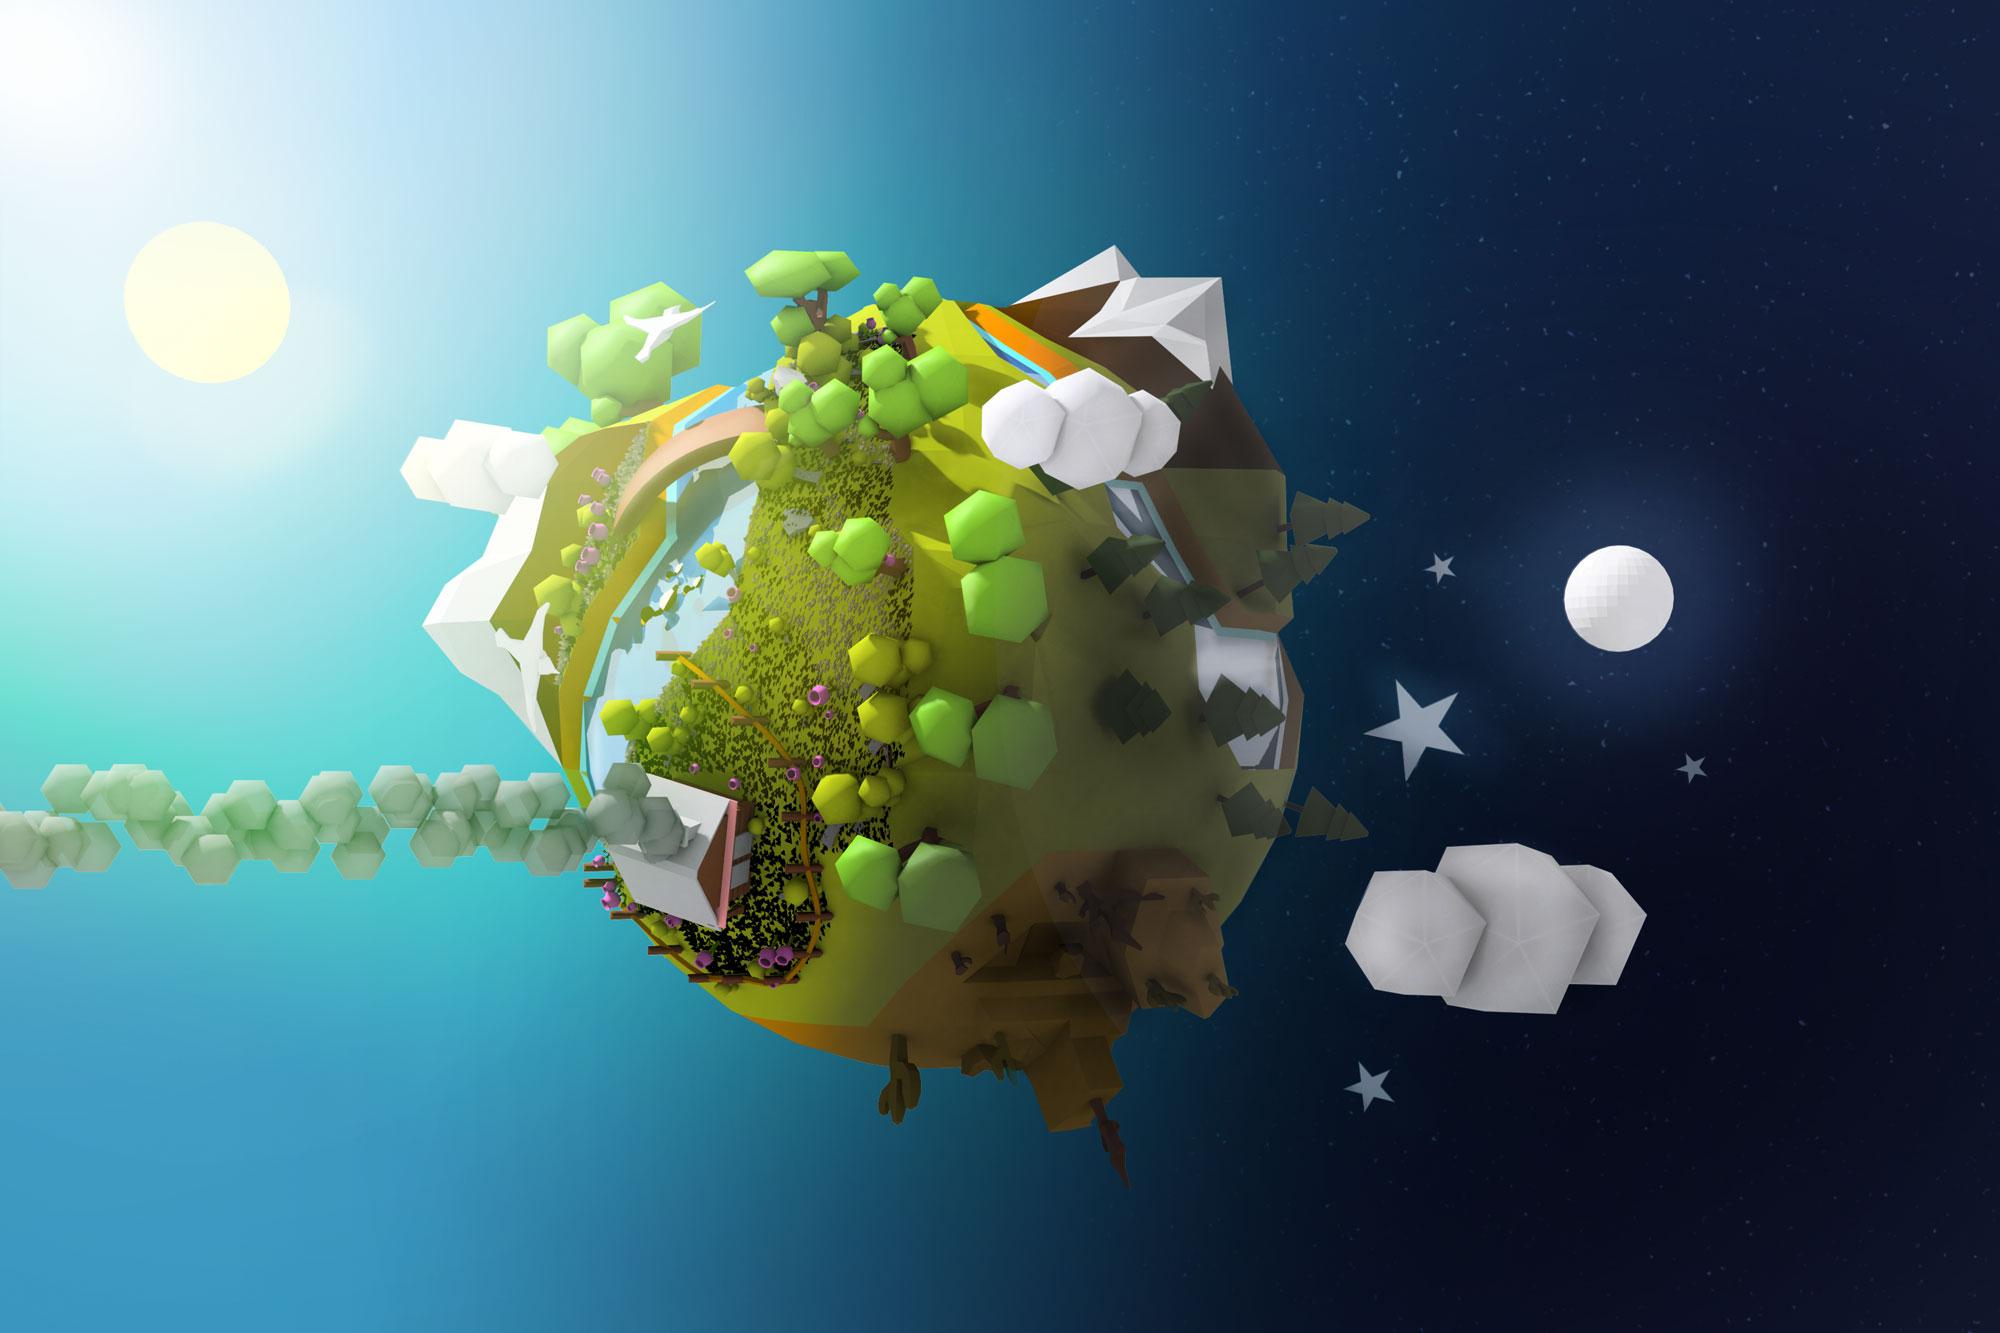 Polygon Planet